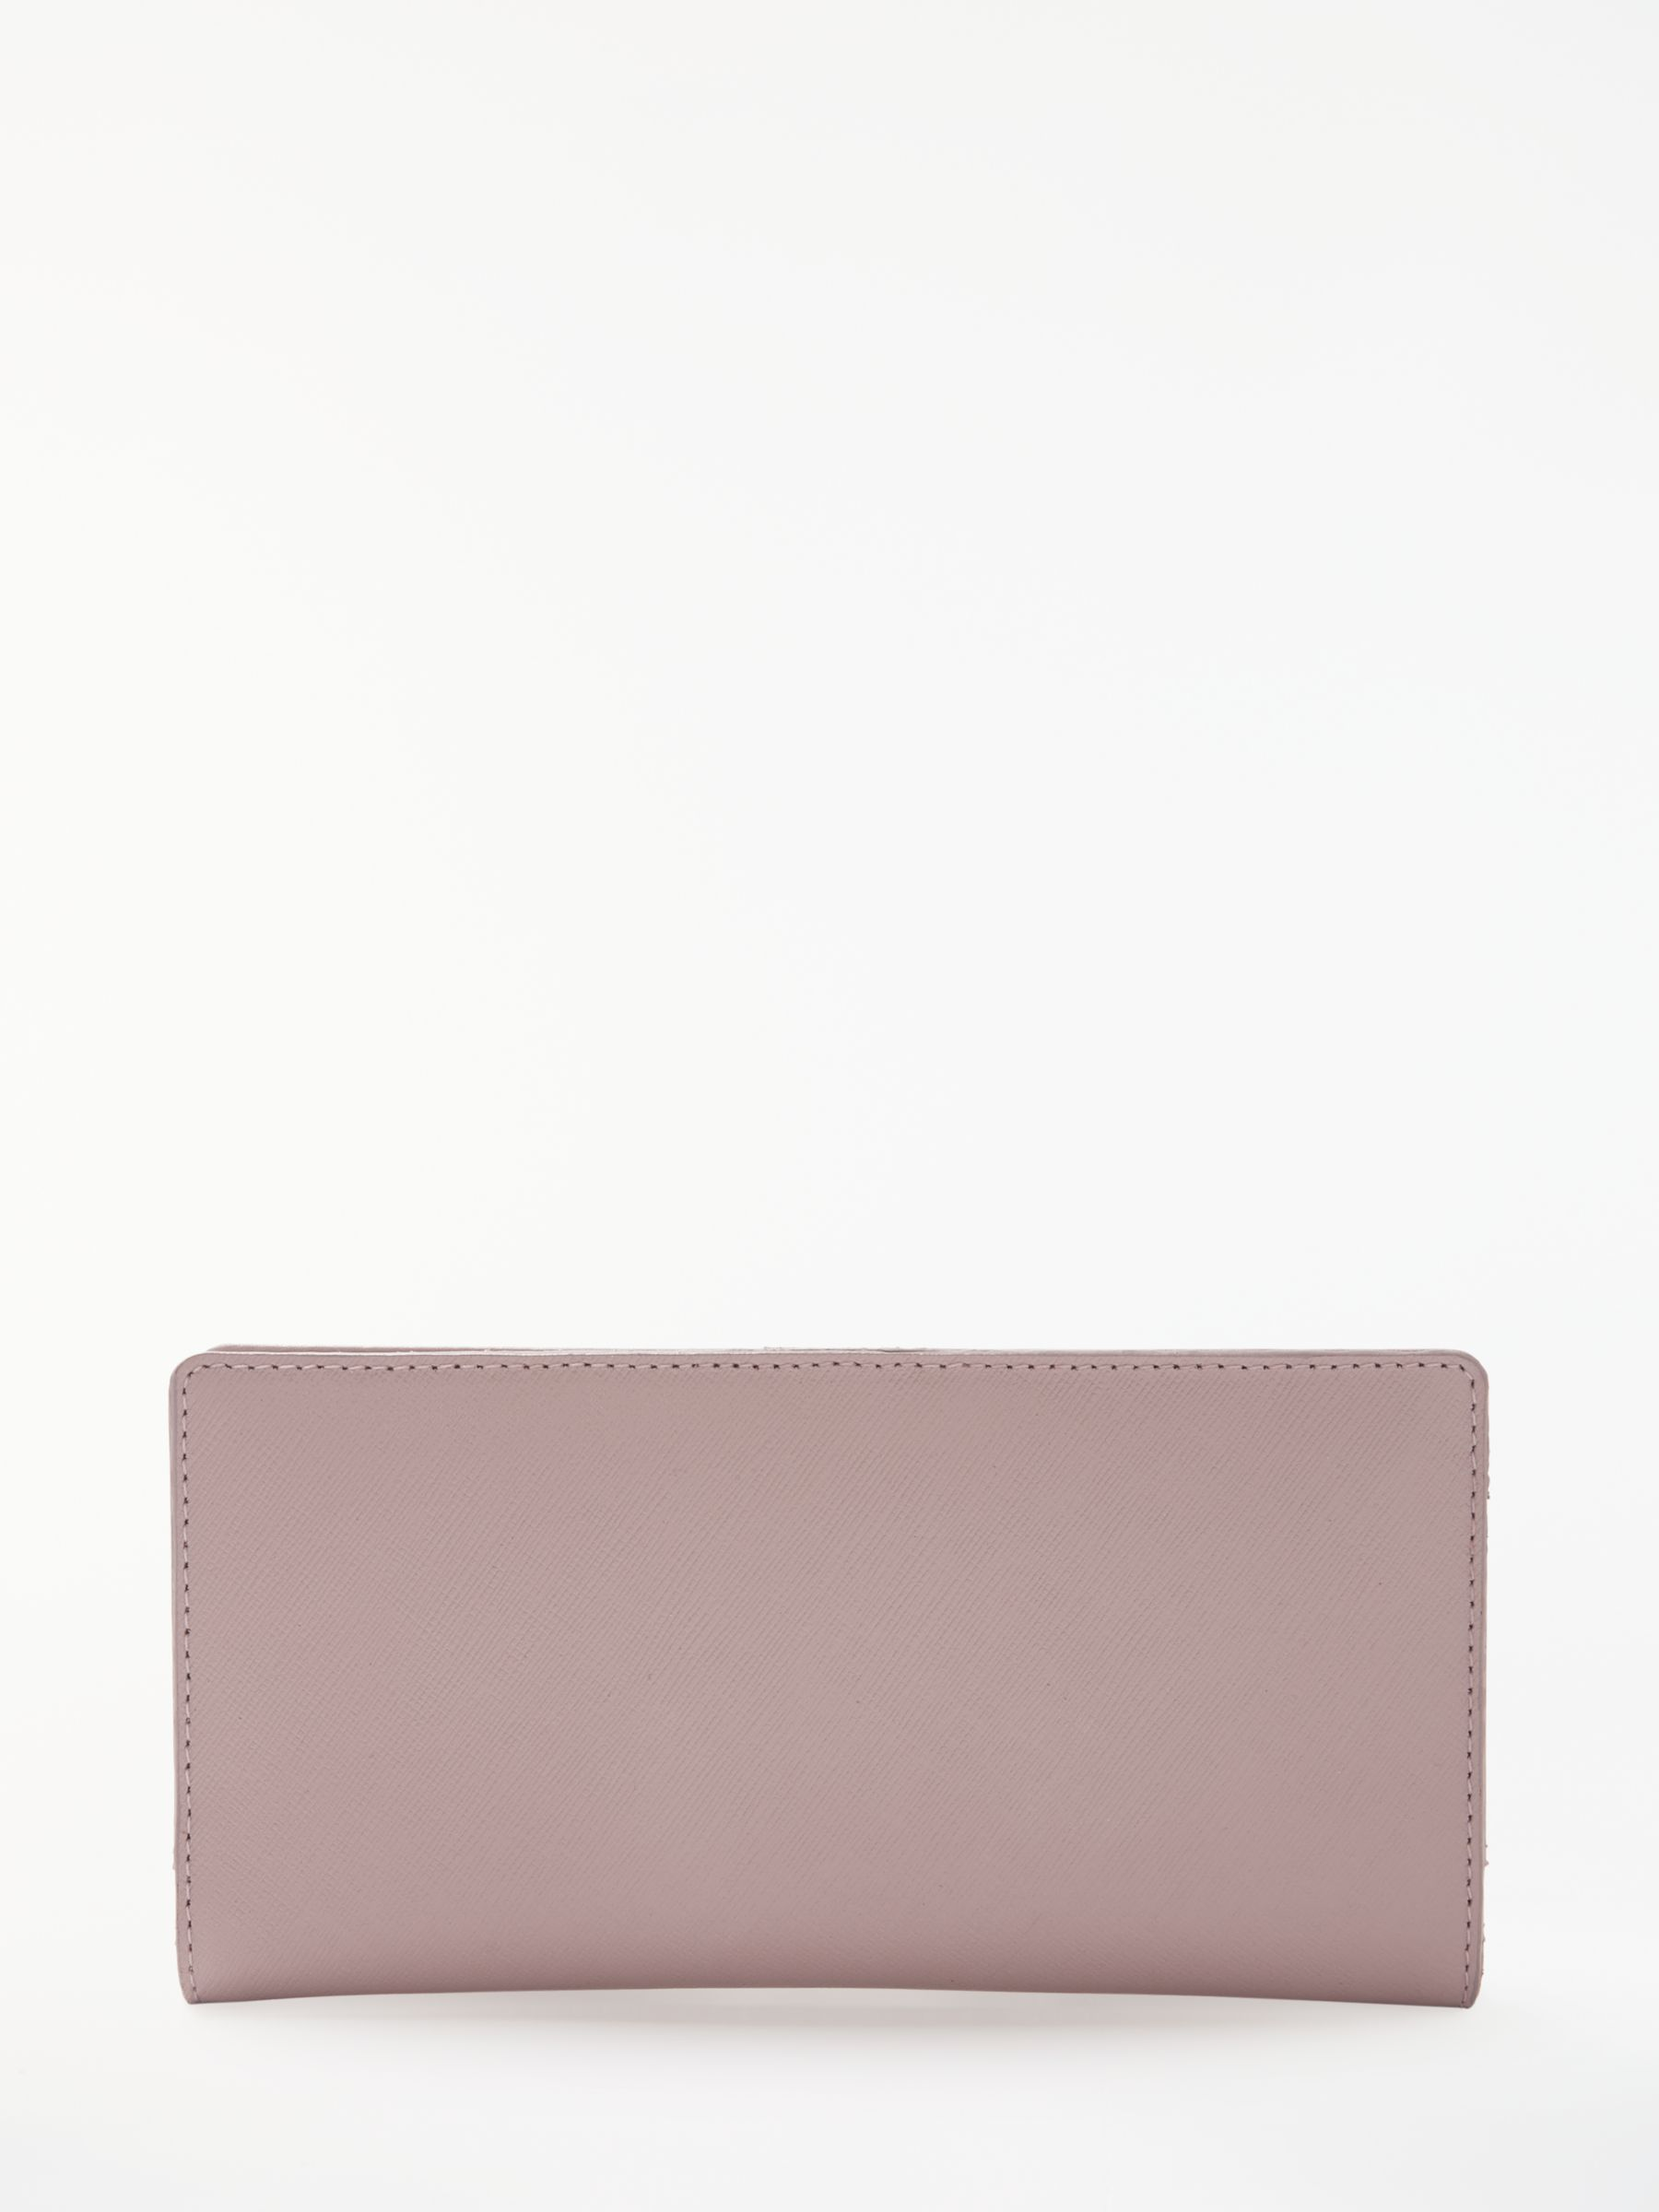 69e77874944 John Lewis & Partners Marie Saffiano Leather Foldover Purse, Pink at John  Lewis & Partners